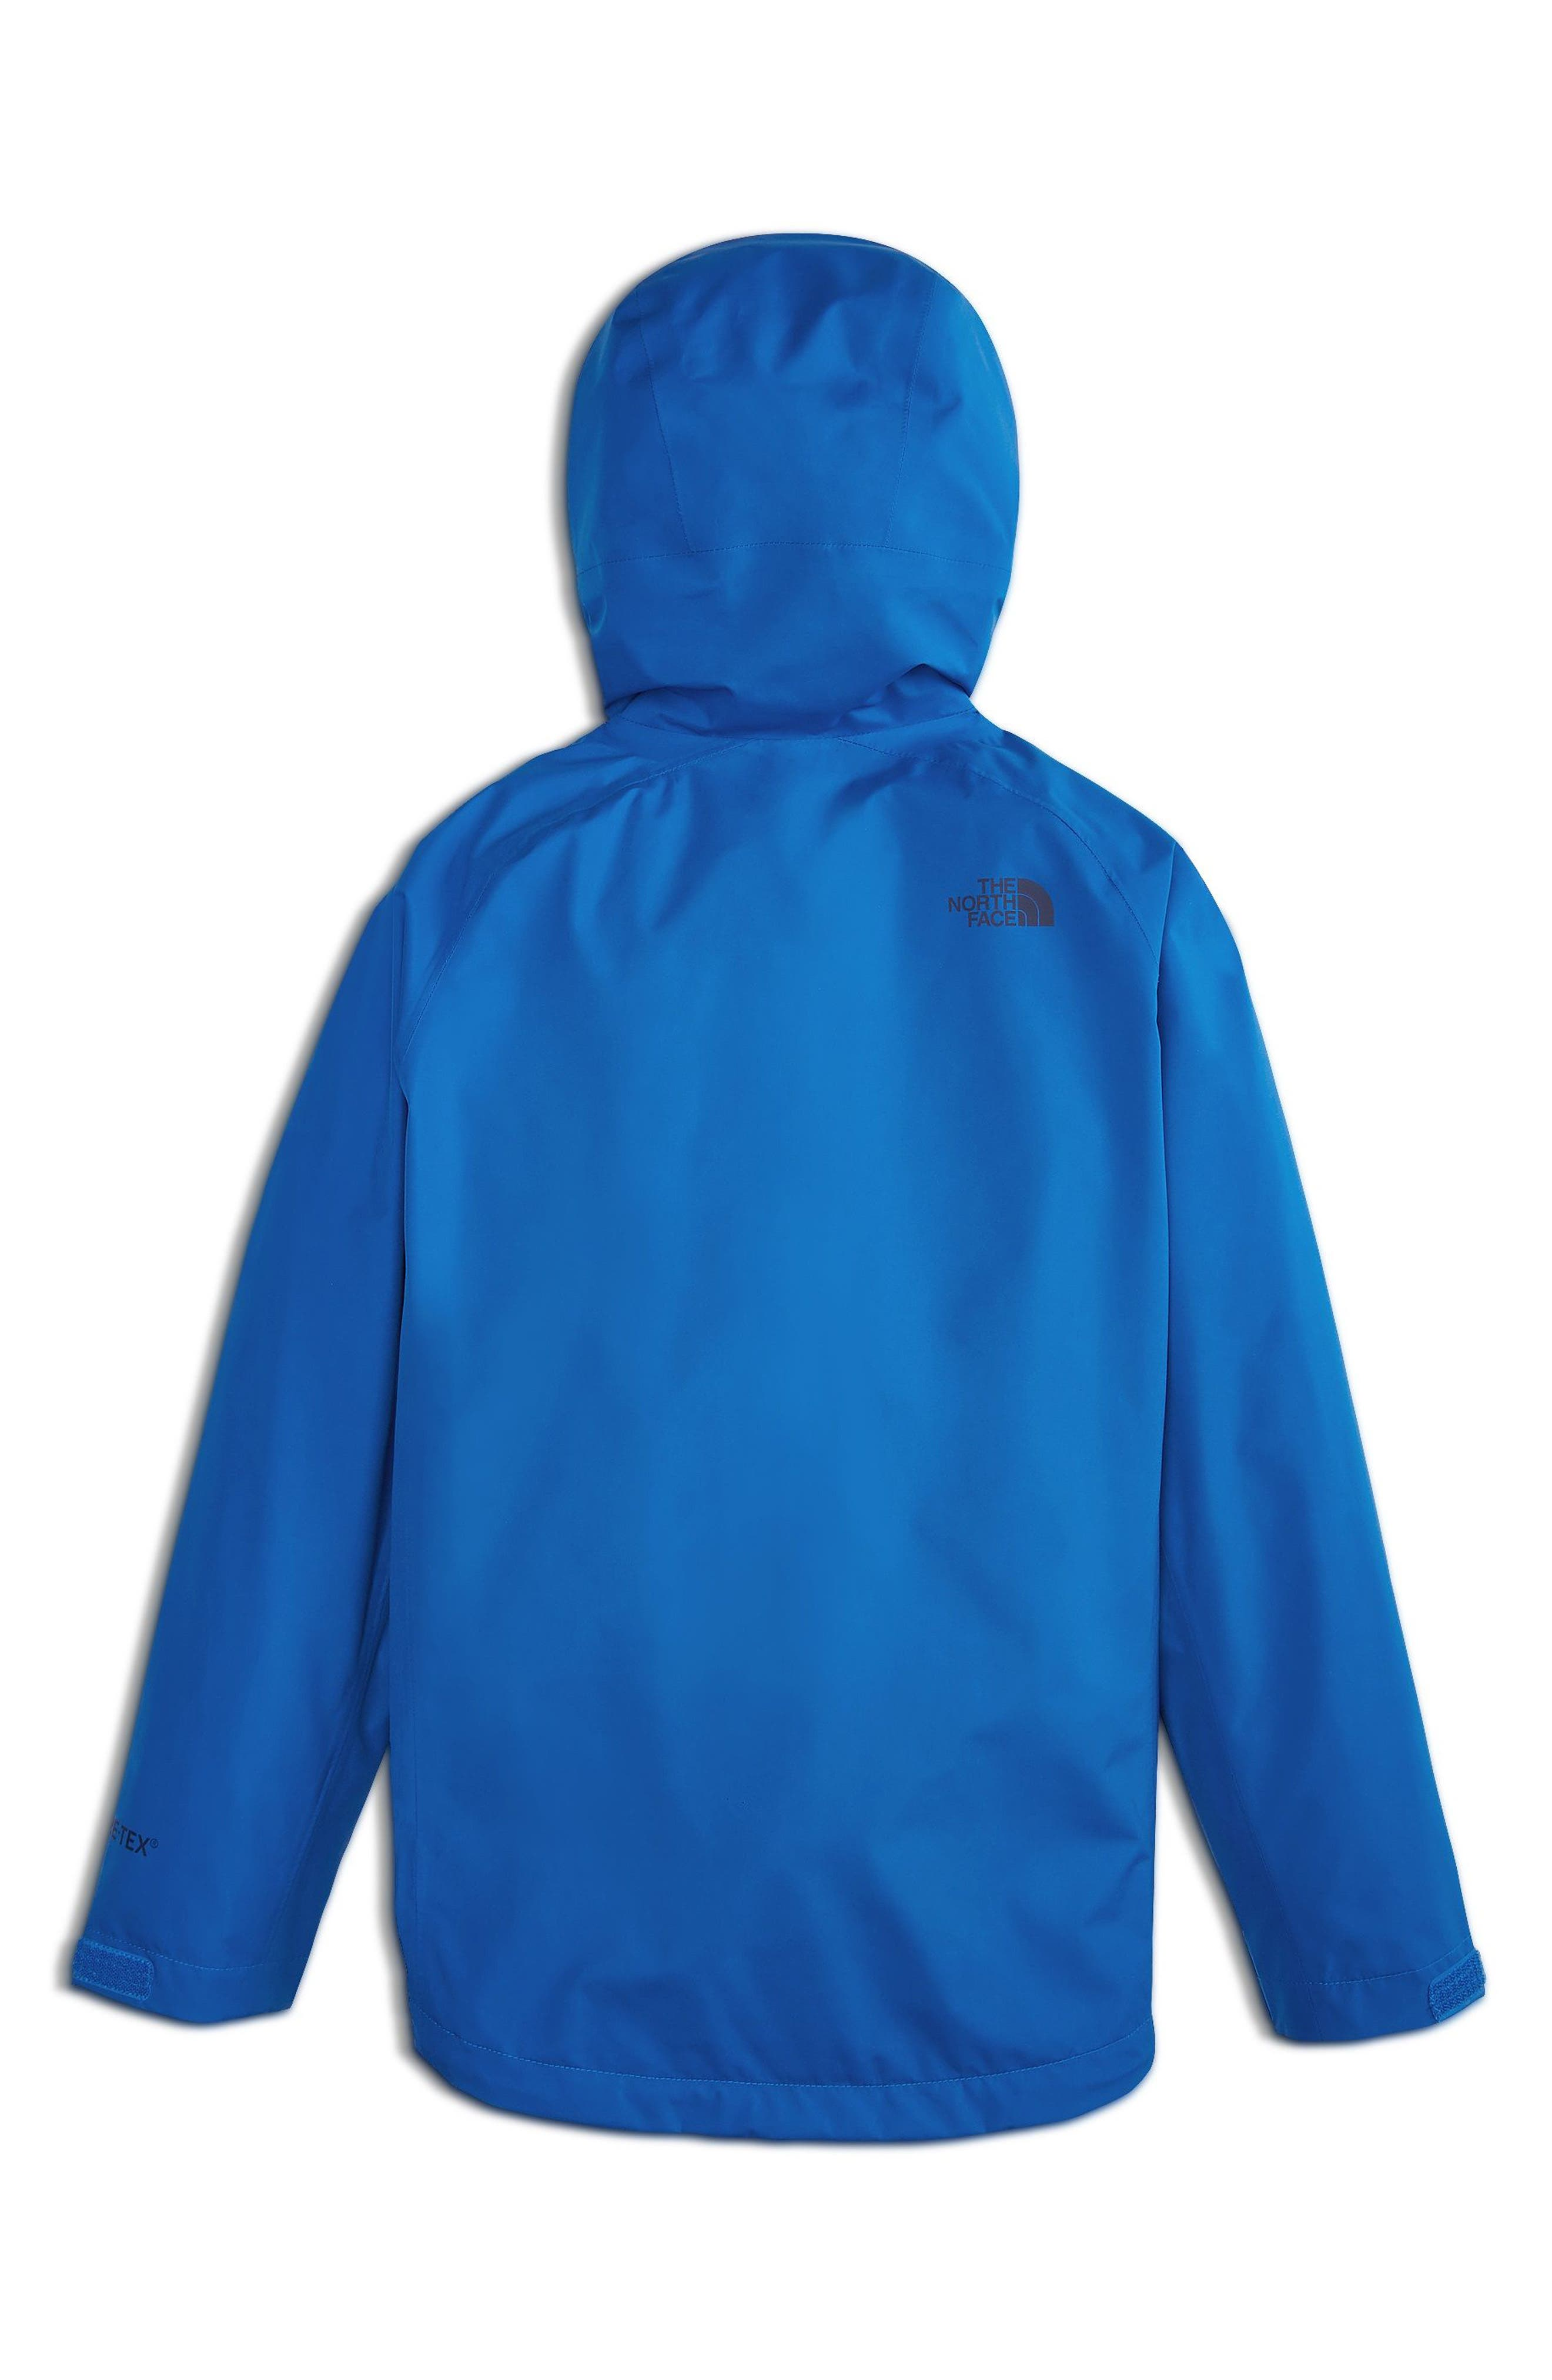 Dryzzle Gore-Tex<sup>®</sup> Waterproof Jacket,                             Main thumbnail 1, color,                             TURKISH SEA